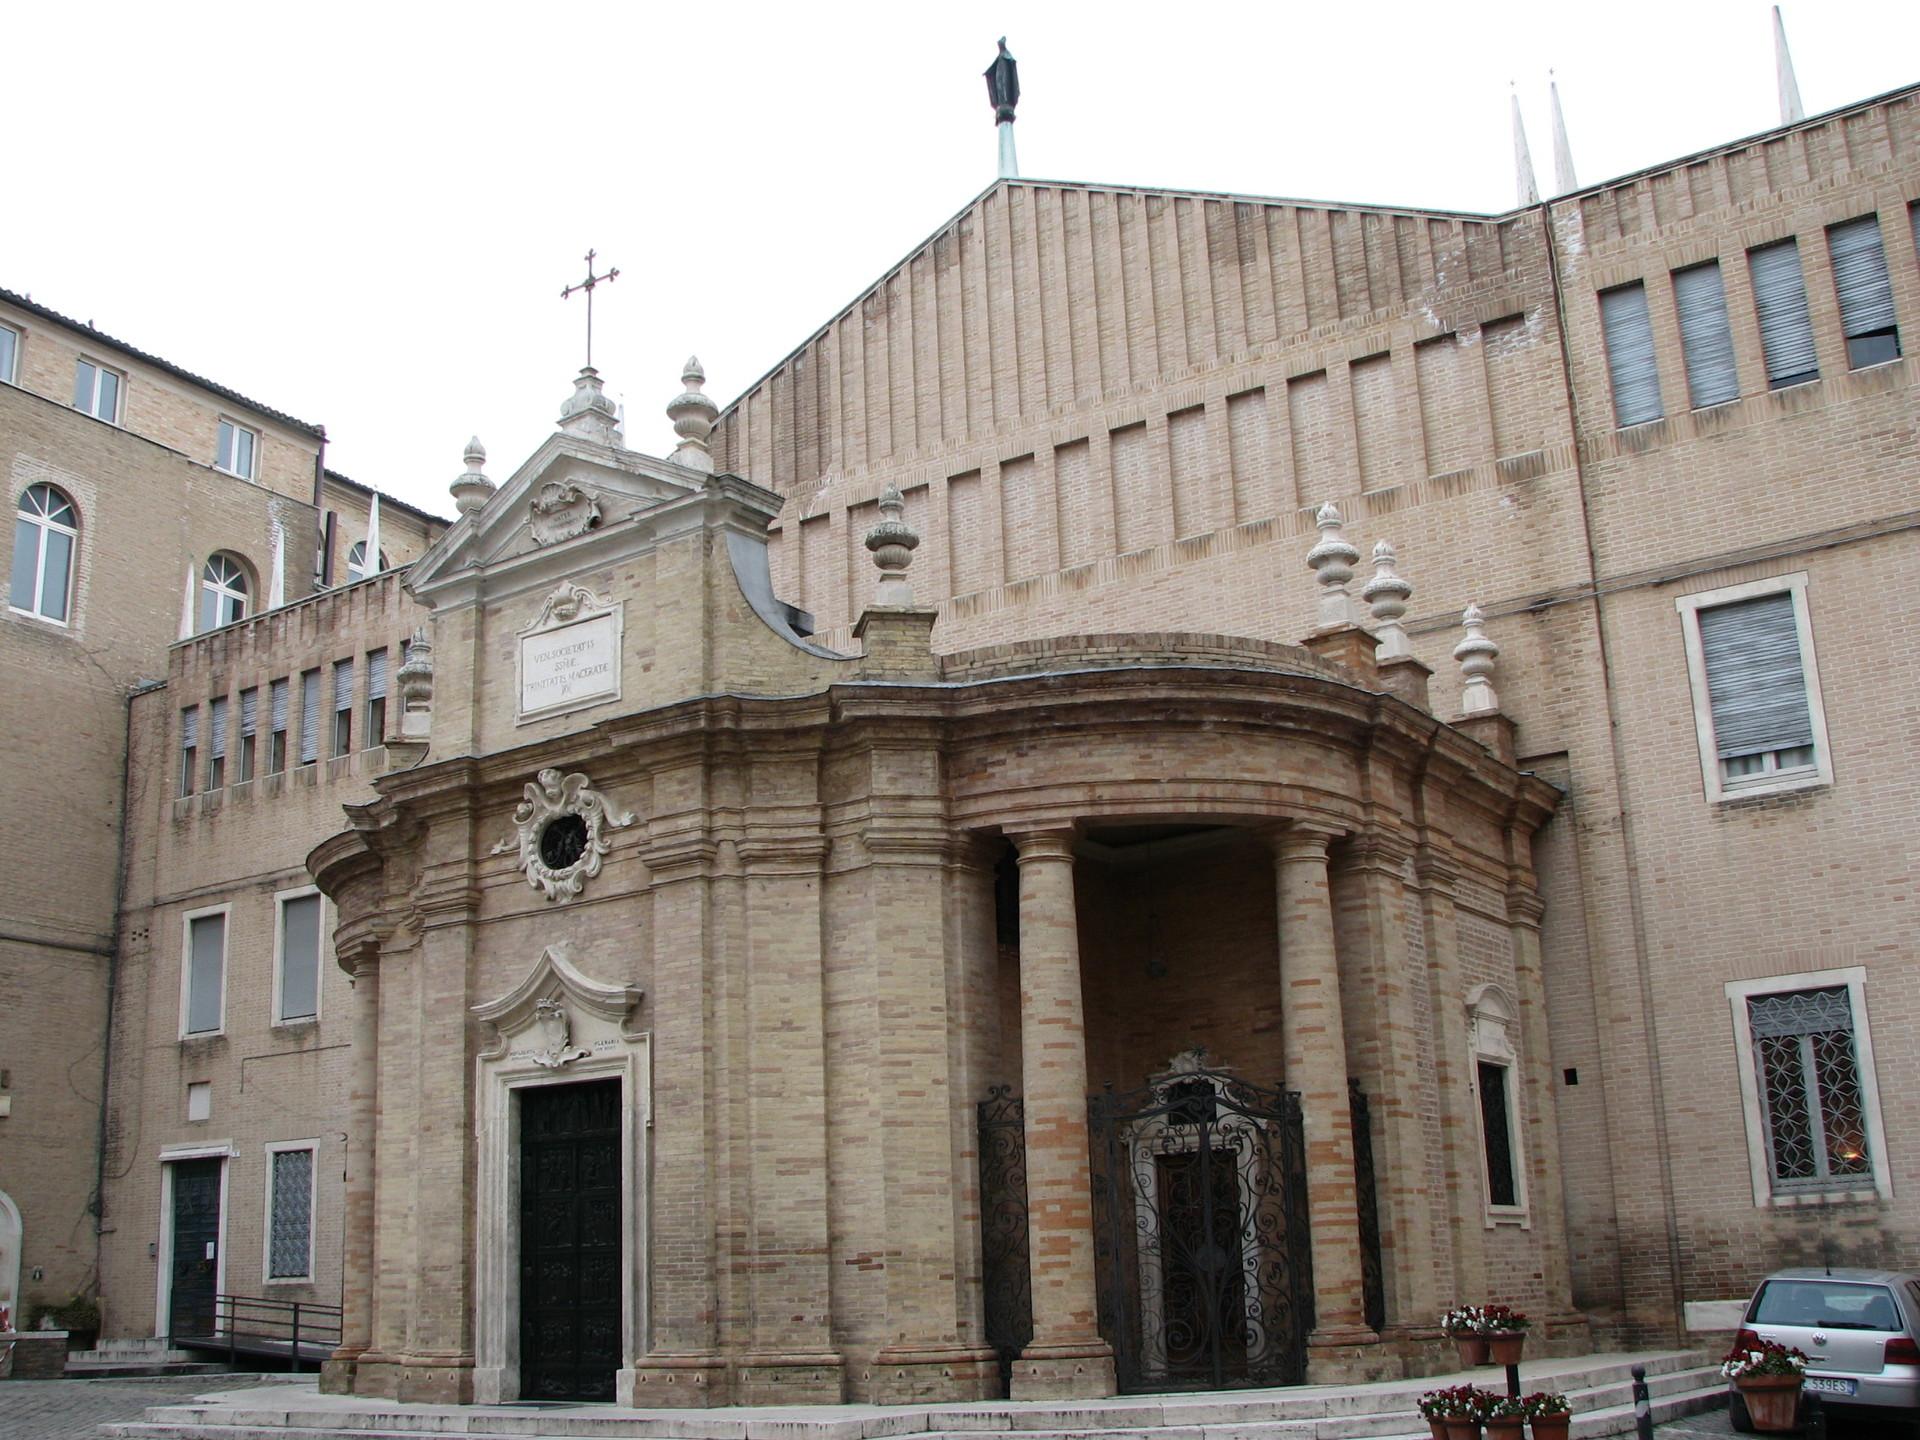 Experiencia en Macerata, Italia de Sohail